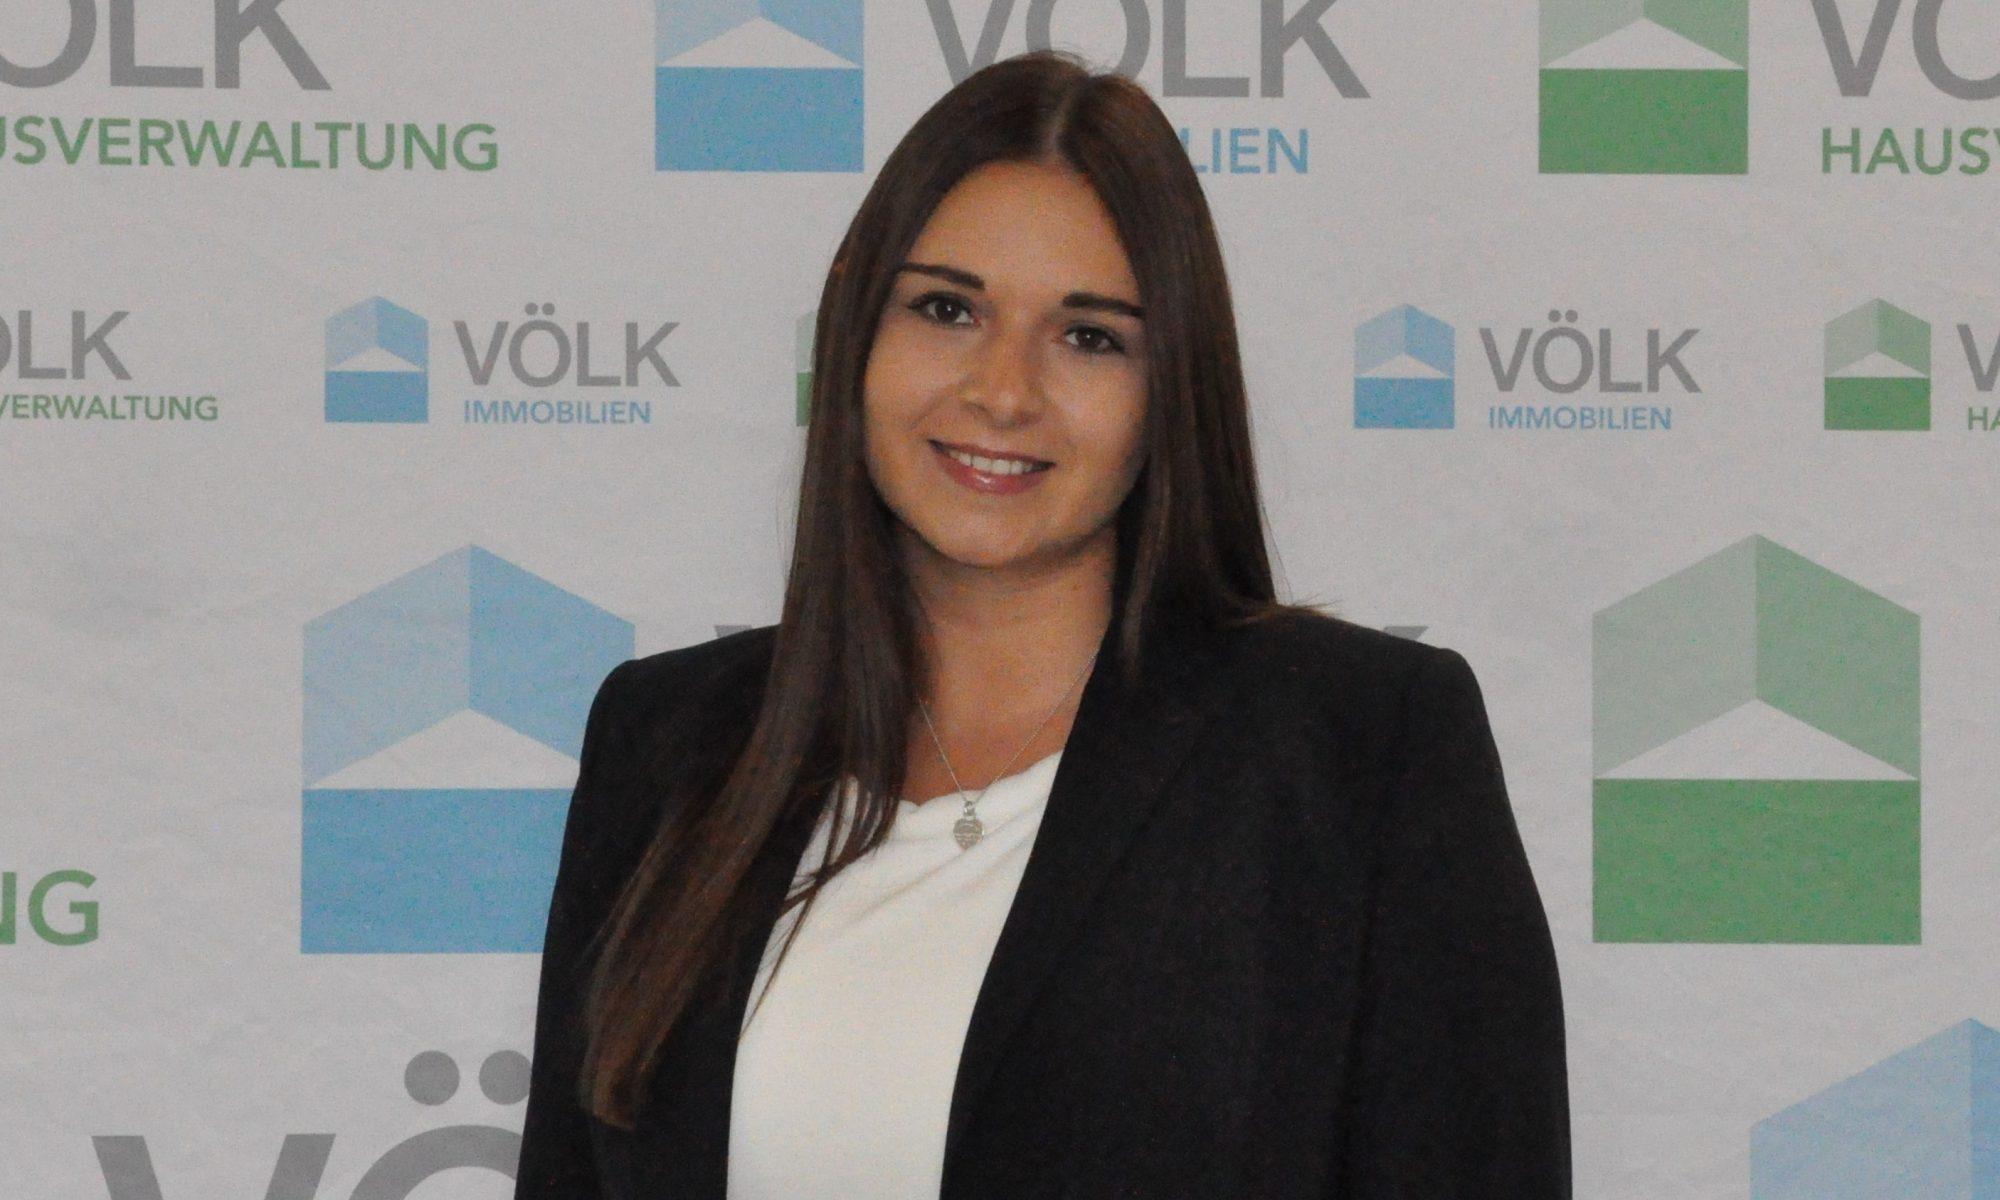 Verstärkung im Team VÖLK Hausverwaltung - Natalie Kuchelmeister